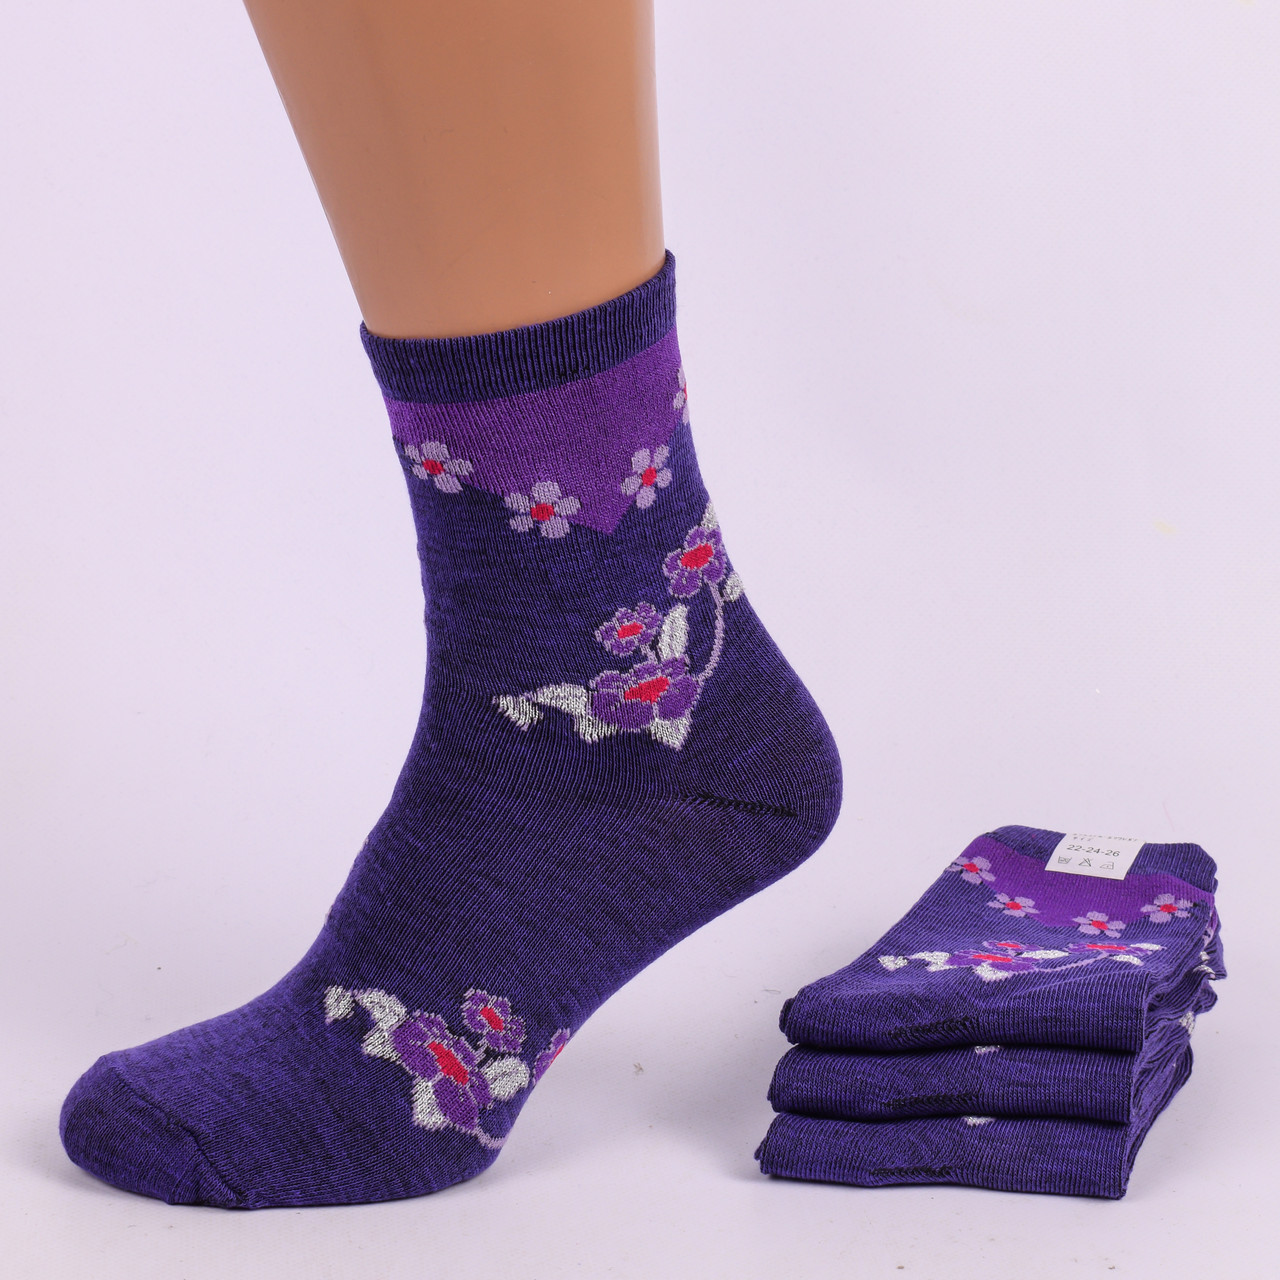 32b6e45d9d68 Самые дешёвые цены на носки CN-001-11. В упаковке 12 пар